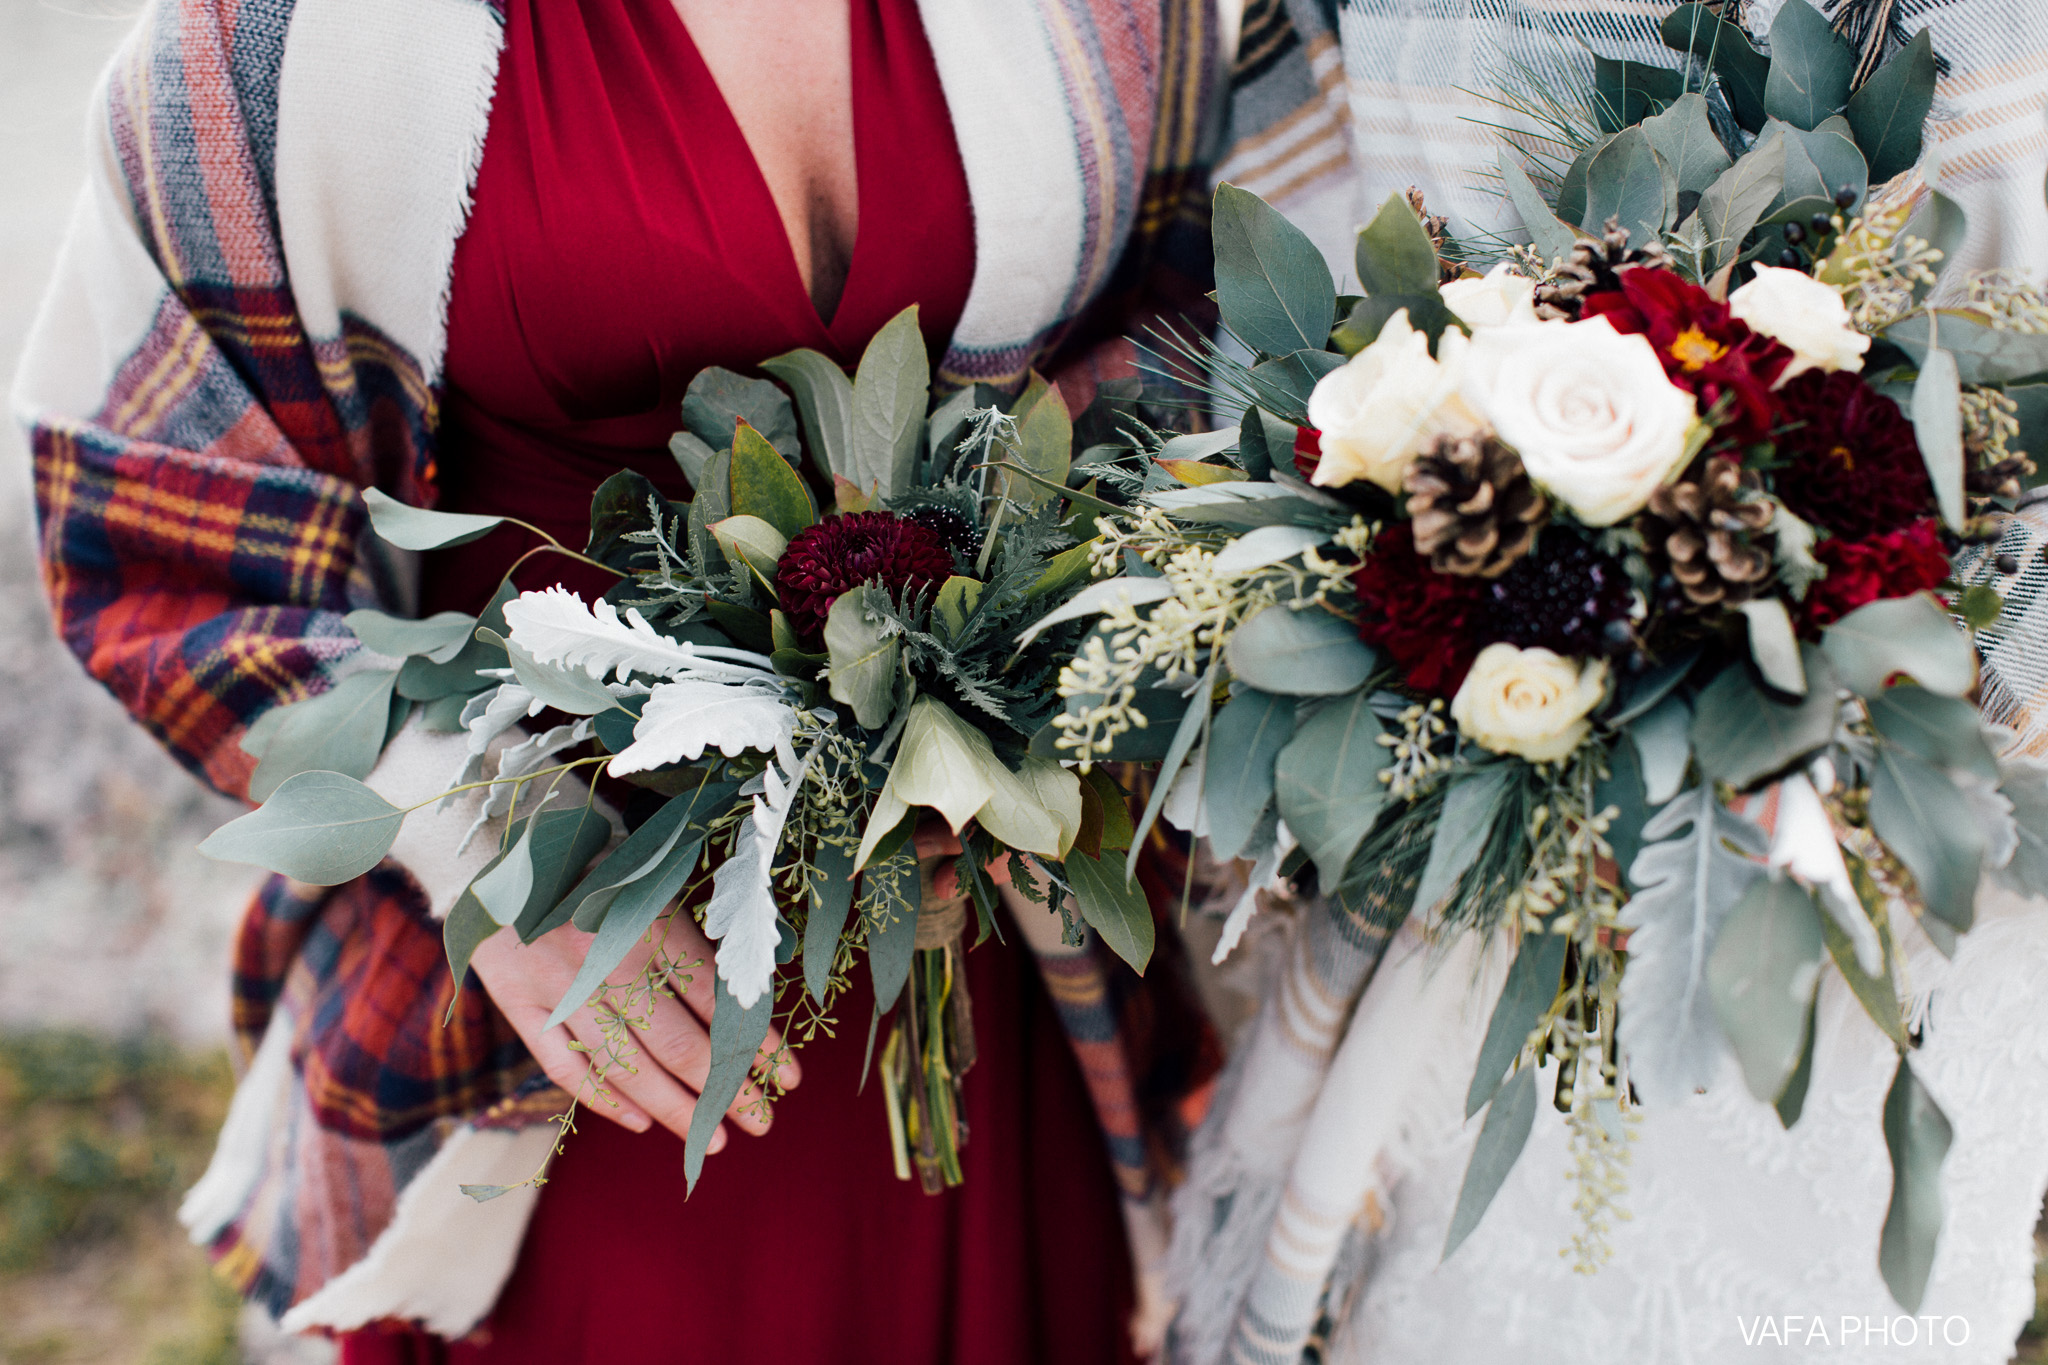 Hogback-Mountain-Wedding-Chelsea-Josh-Vafa-Photo-323.jpg